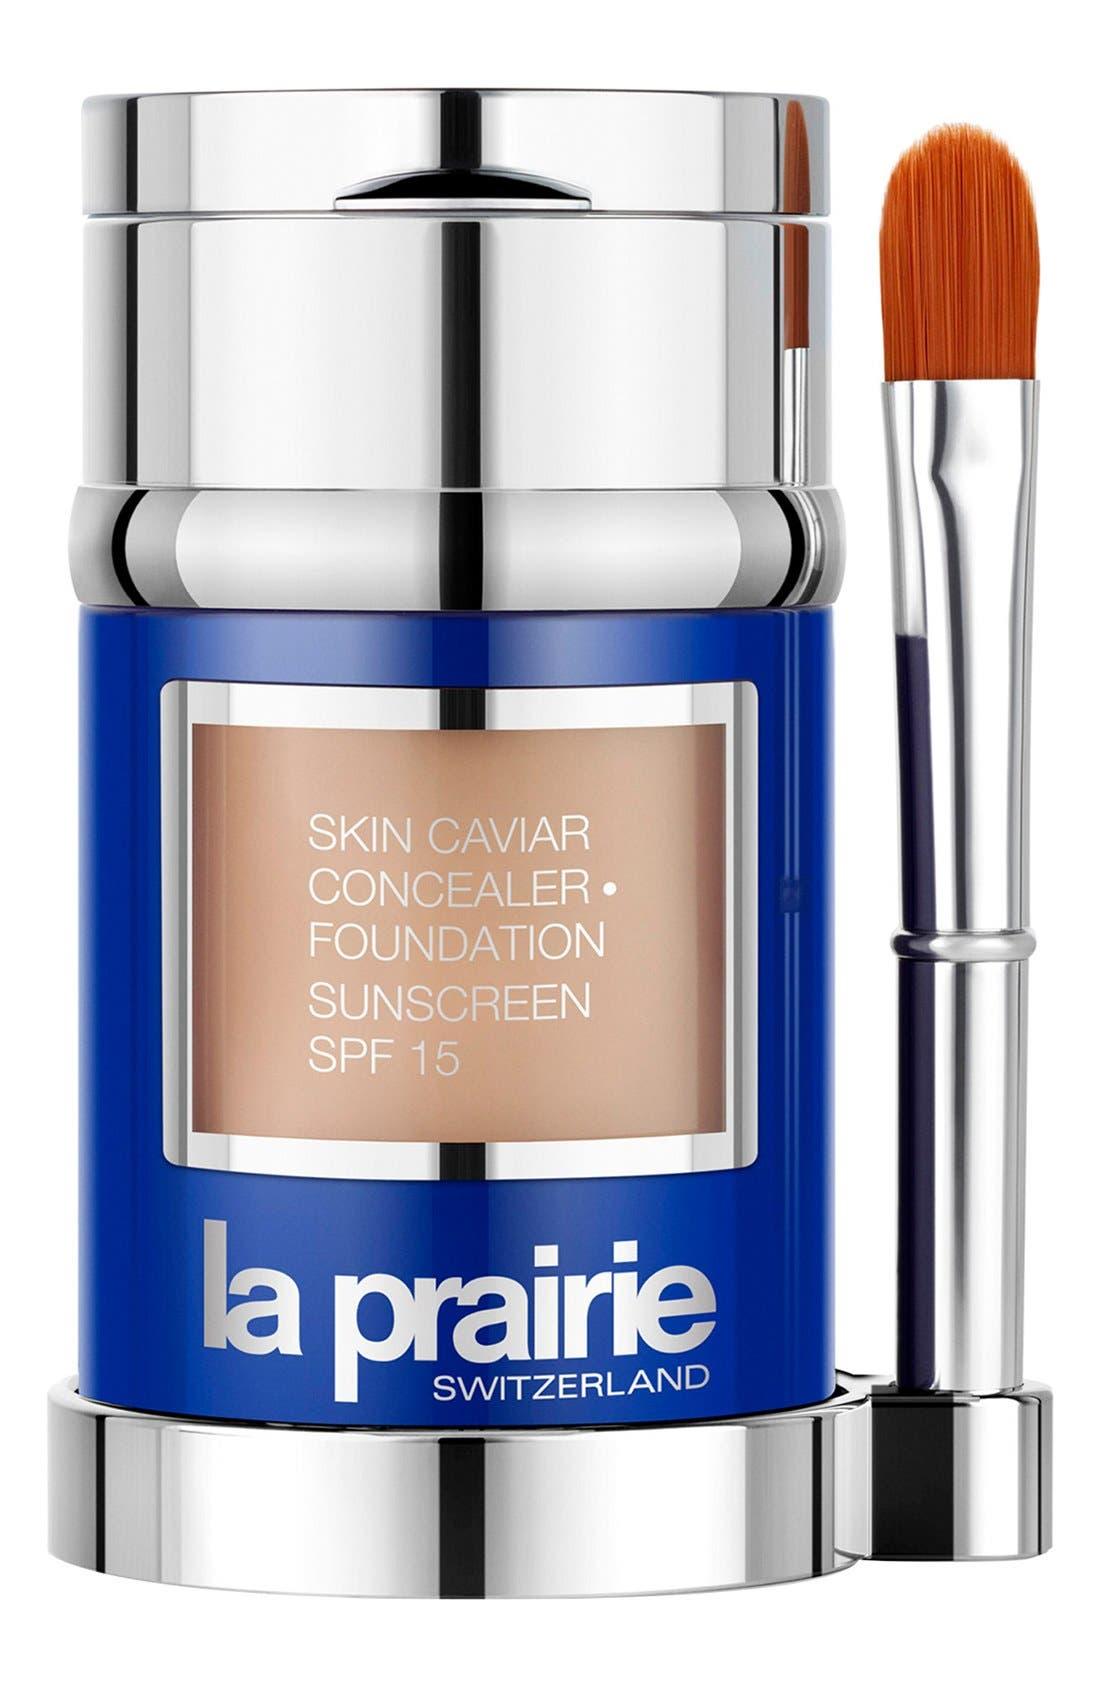 Skin Caviar Concealer + Foundation Sunscreen SPF 15,                         Main,                         color, WARM BEIGE